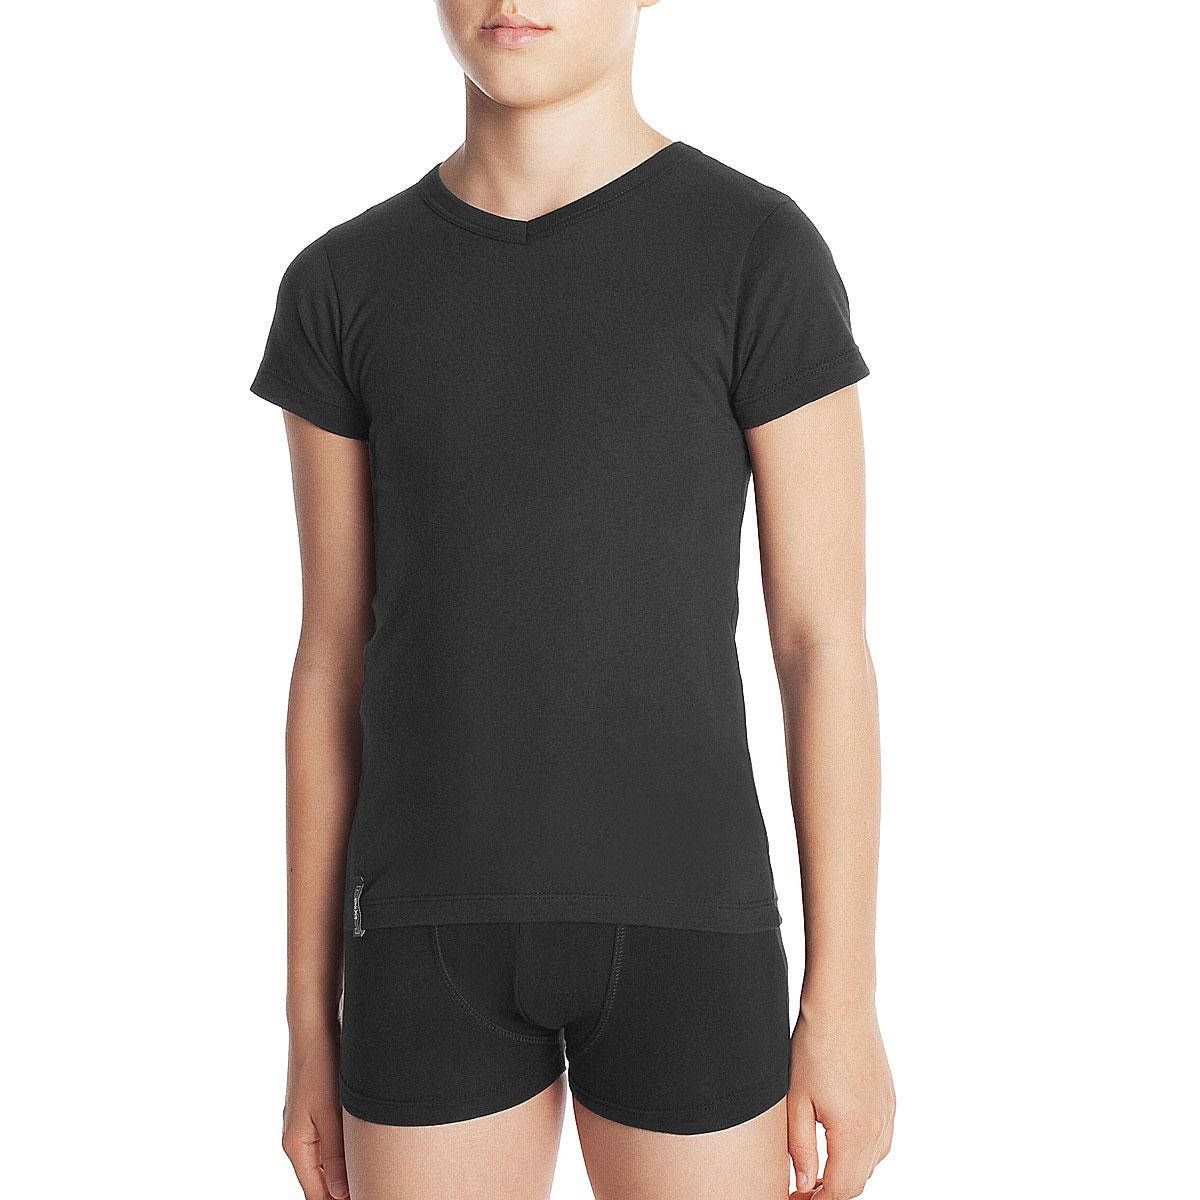 Tee-shirt manches courtes noir col V DYNAMIC Boy